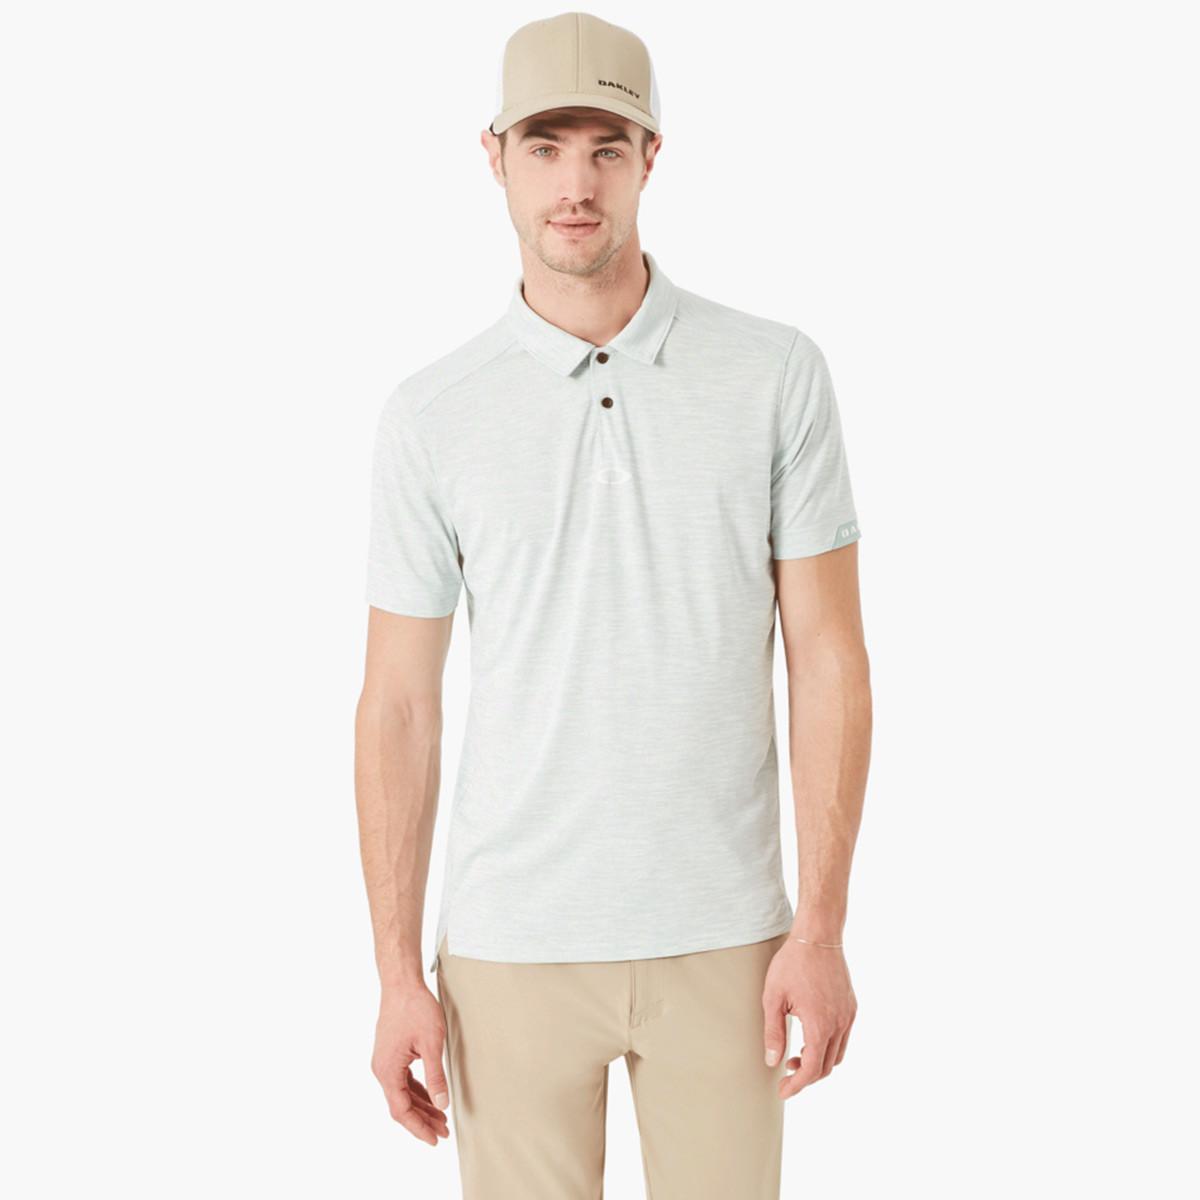 c1b204dda6 Oakley Sport Mens Gravity Golf Polo Shirt